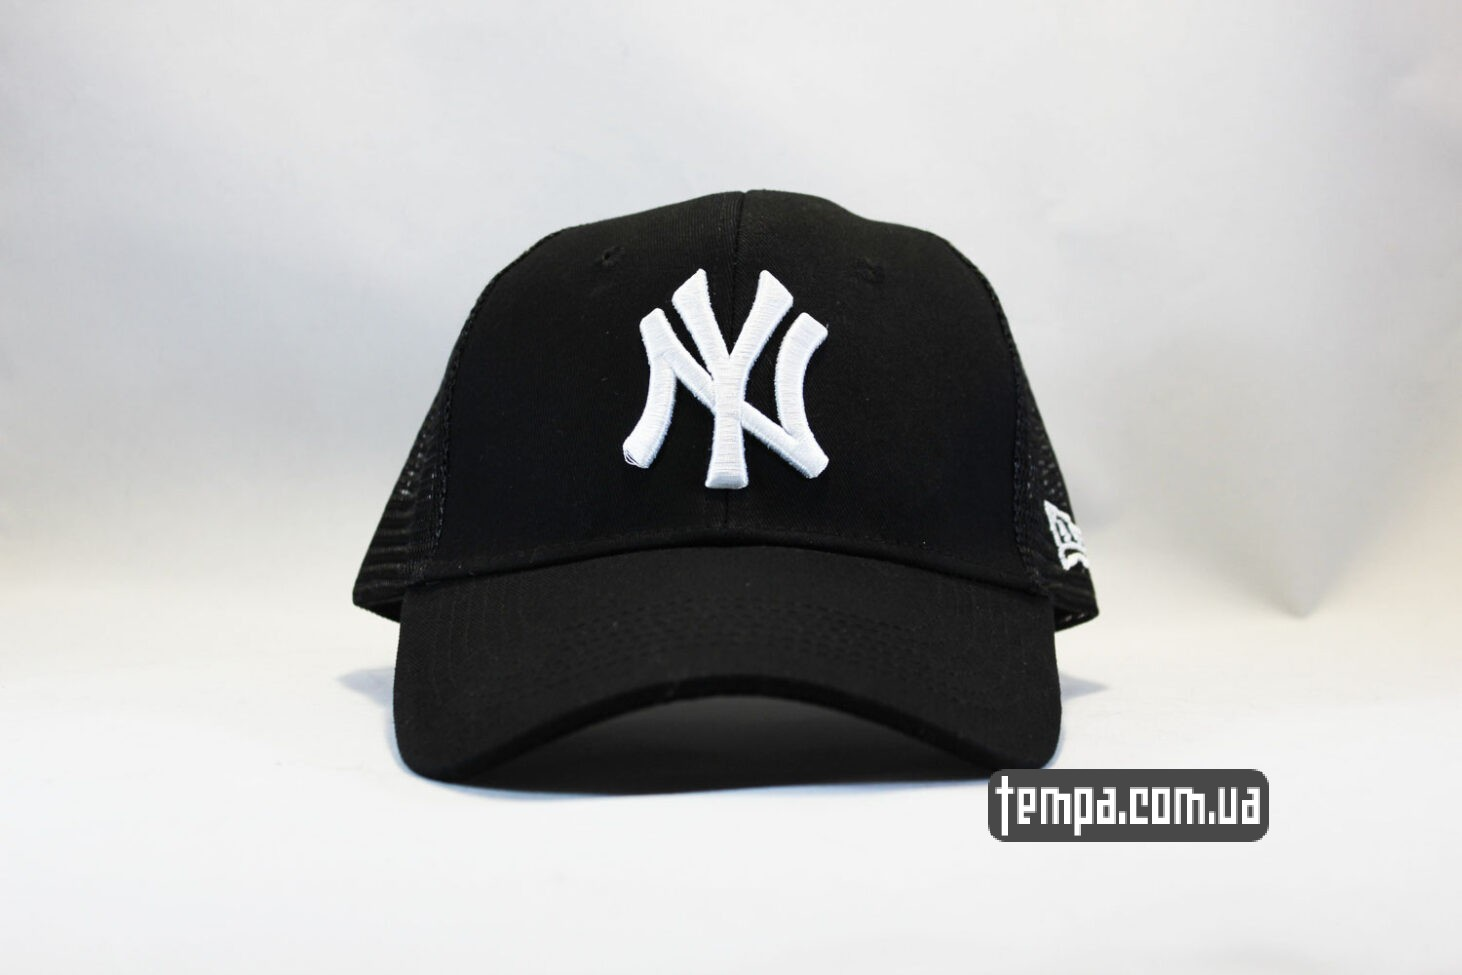 кепка бейсболка Trucker NY New York Yankees черная сеточка